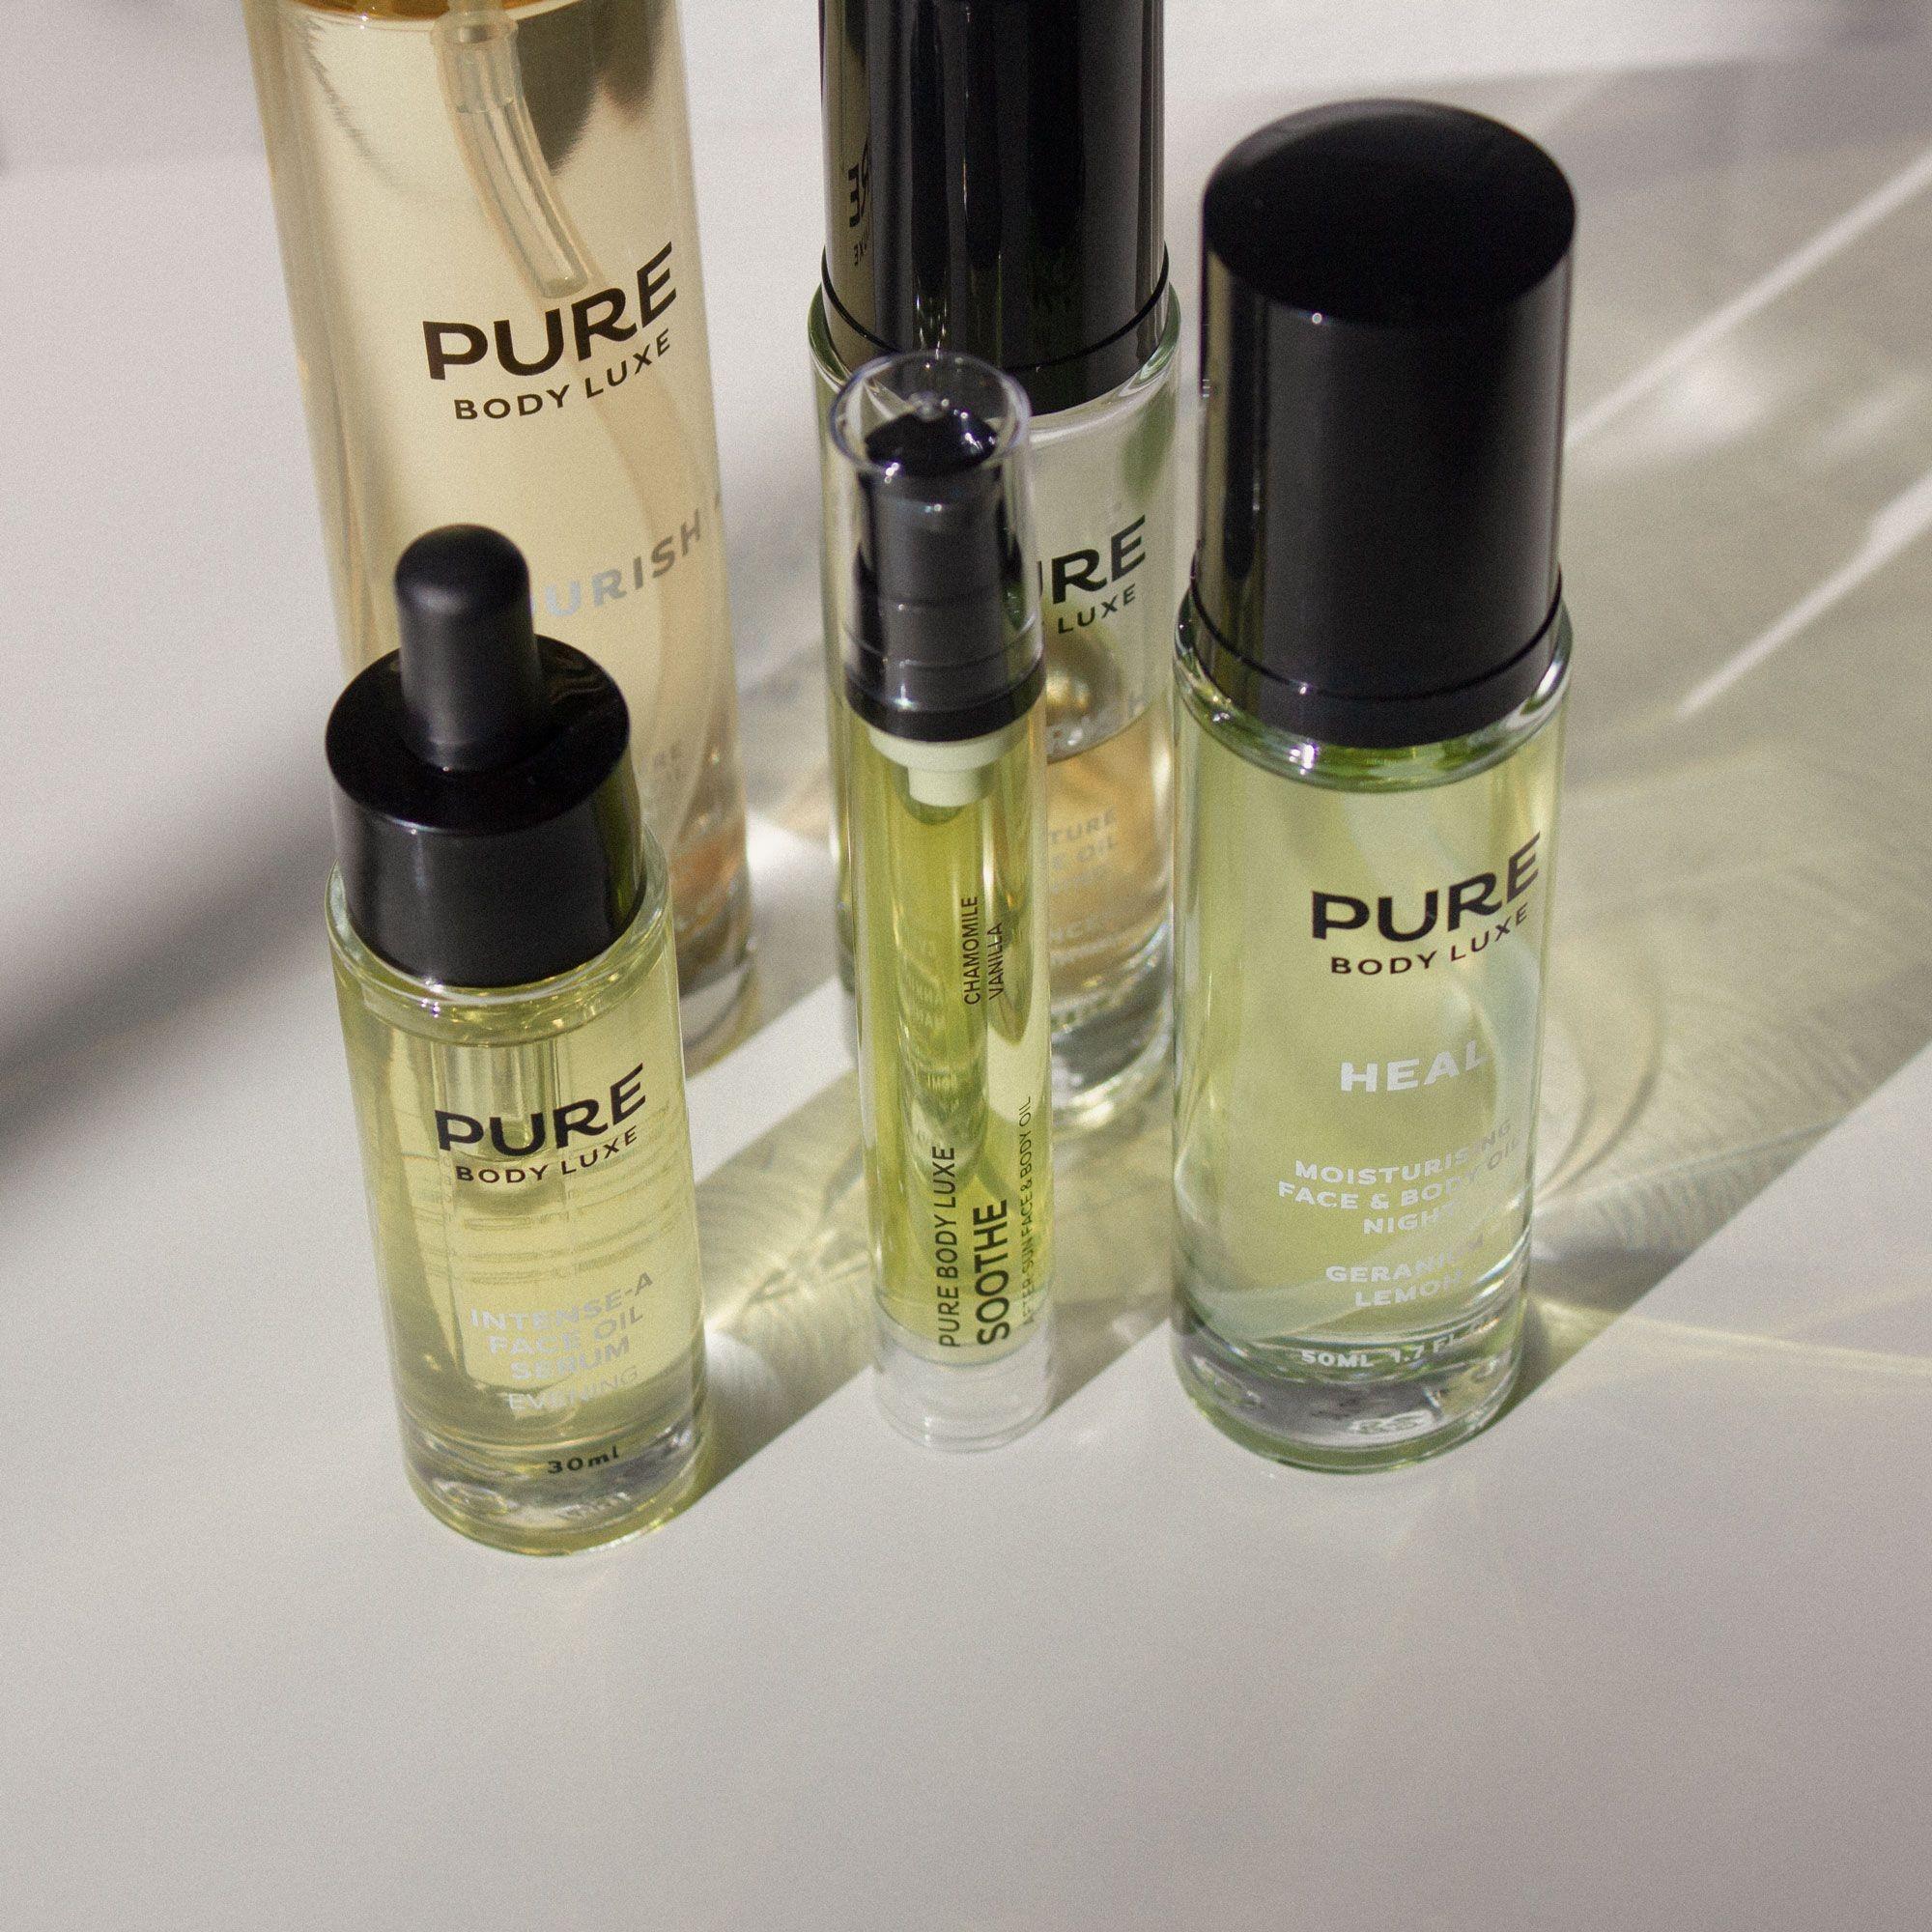 Pure Body Luxe Oils